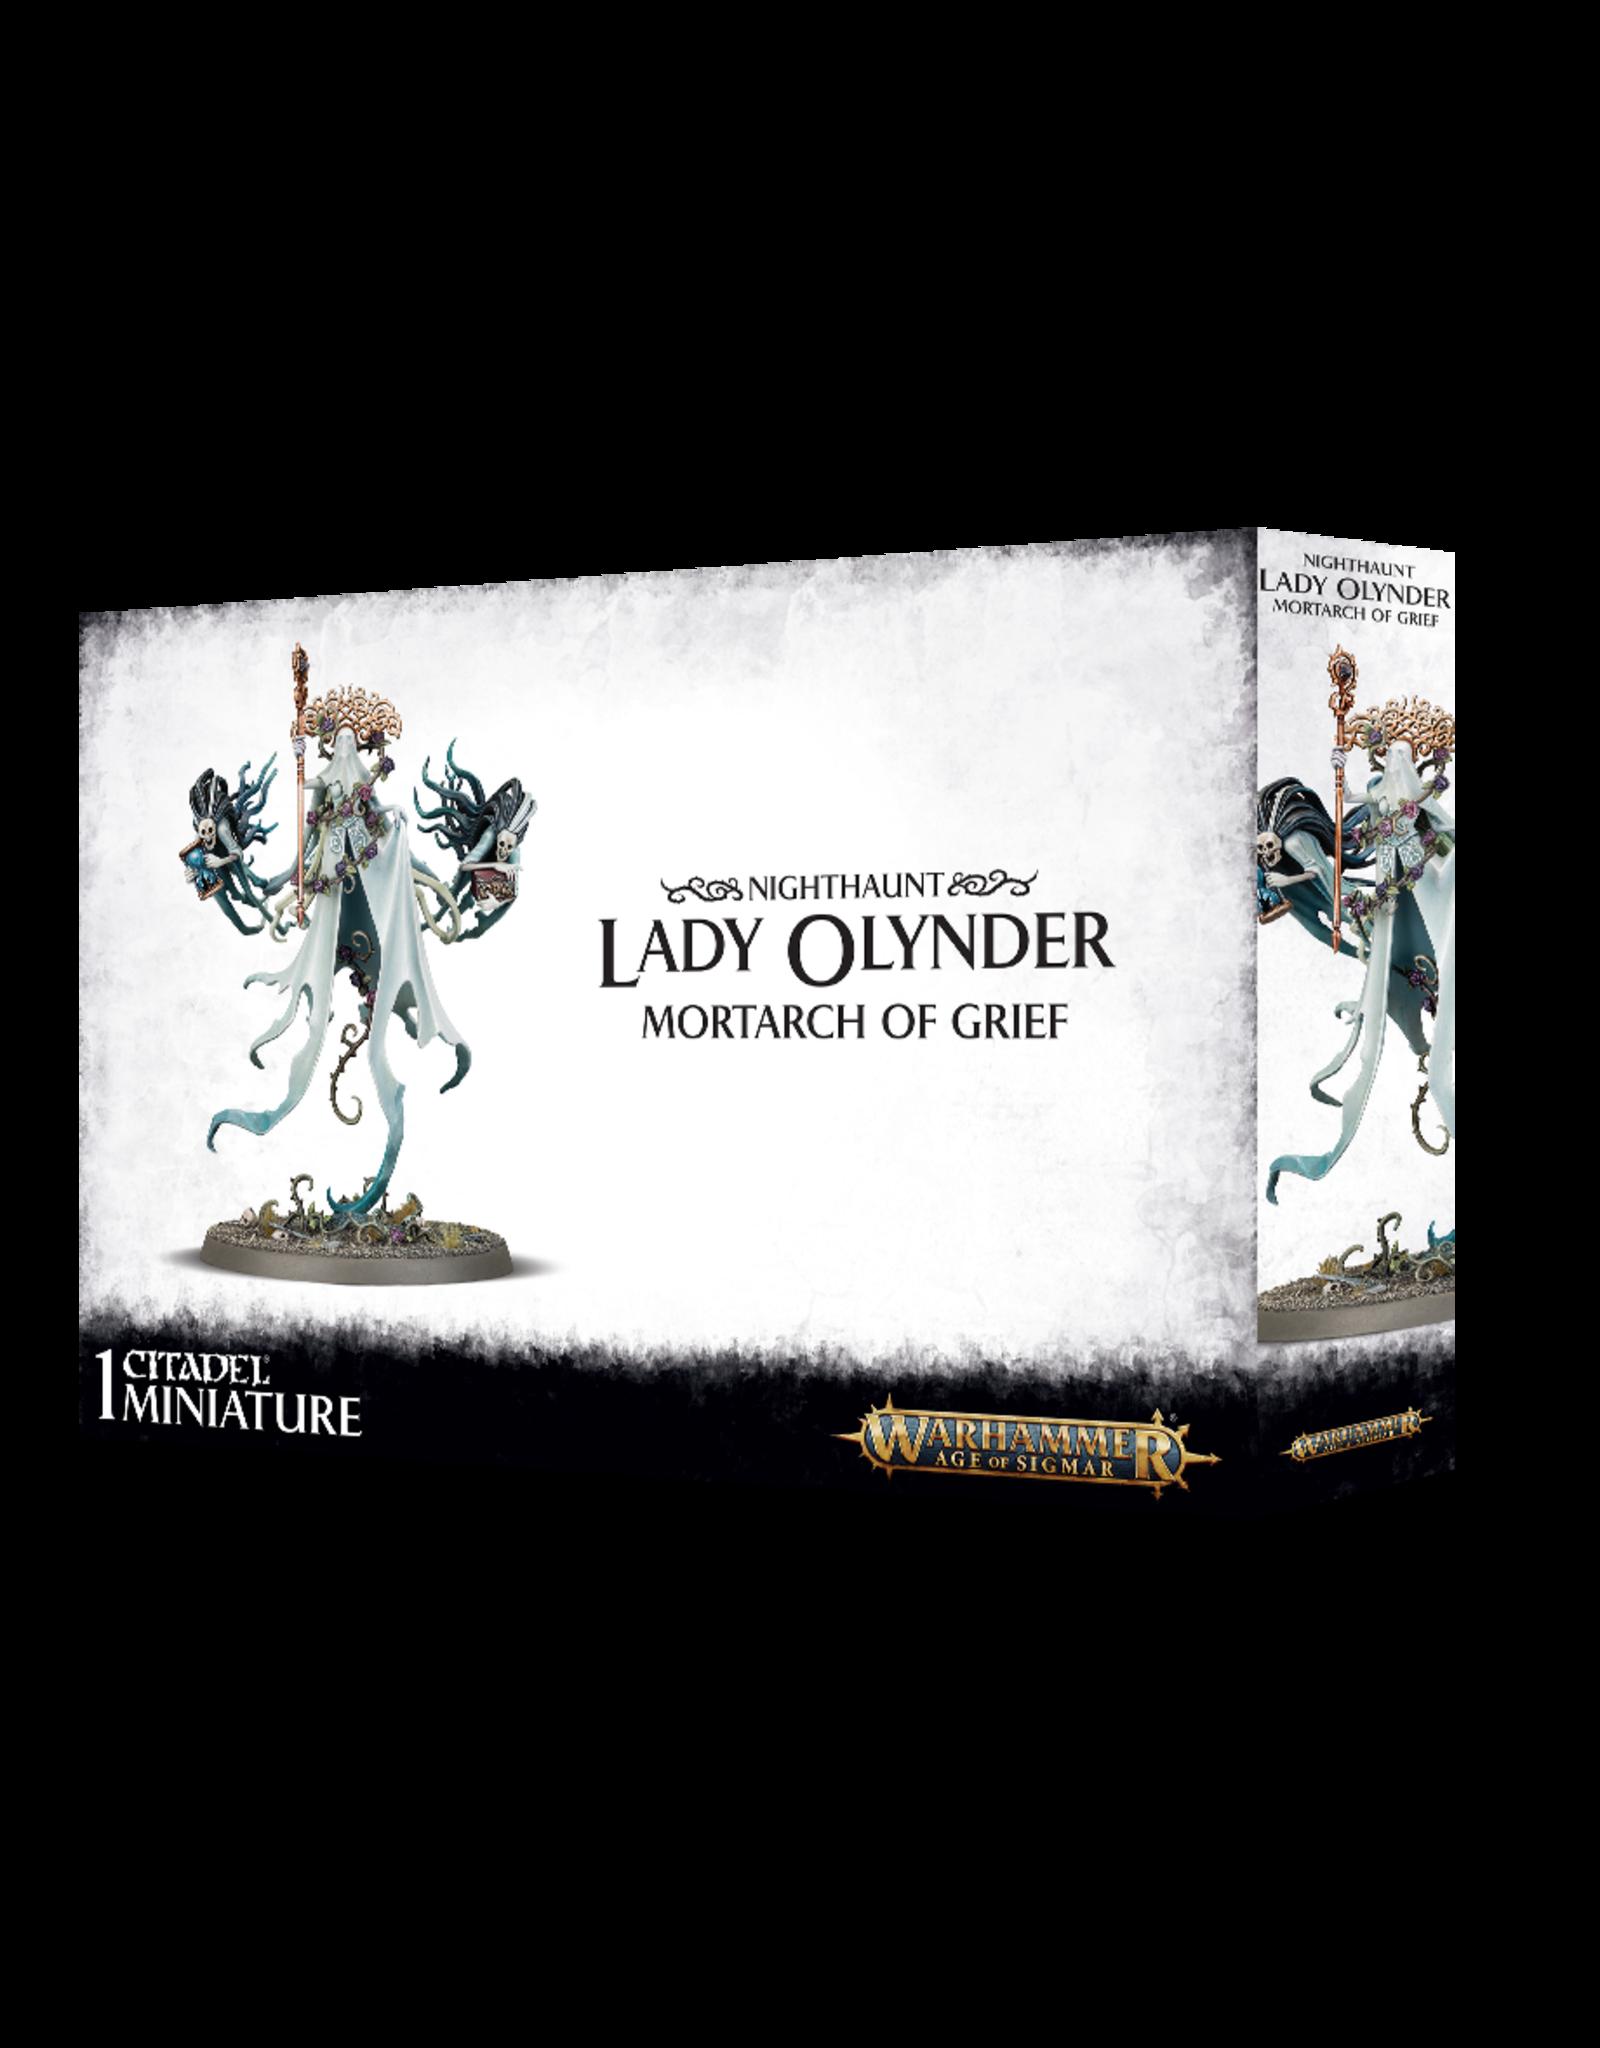 Warhammer Age of Sigmar Lady Olynder, Mortarch of Grief